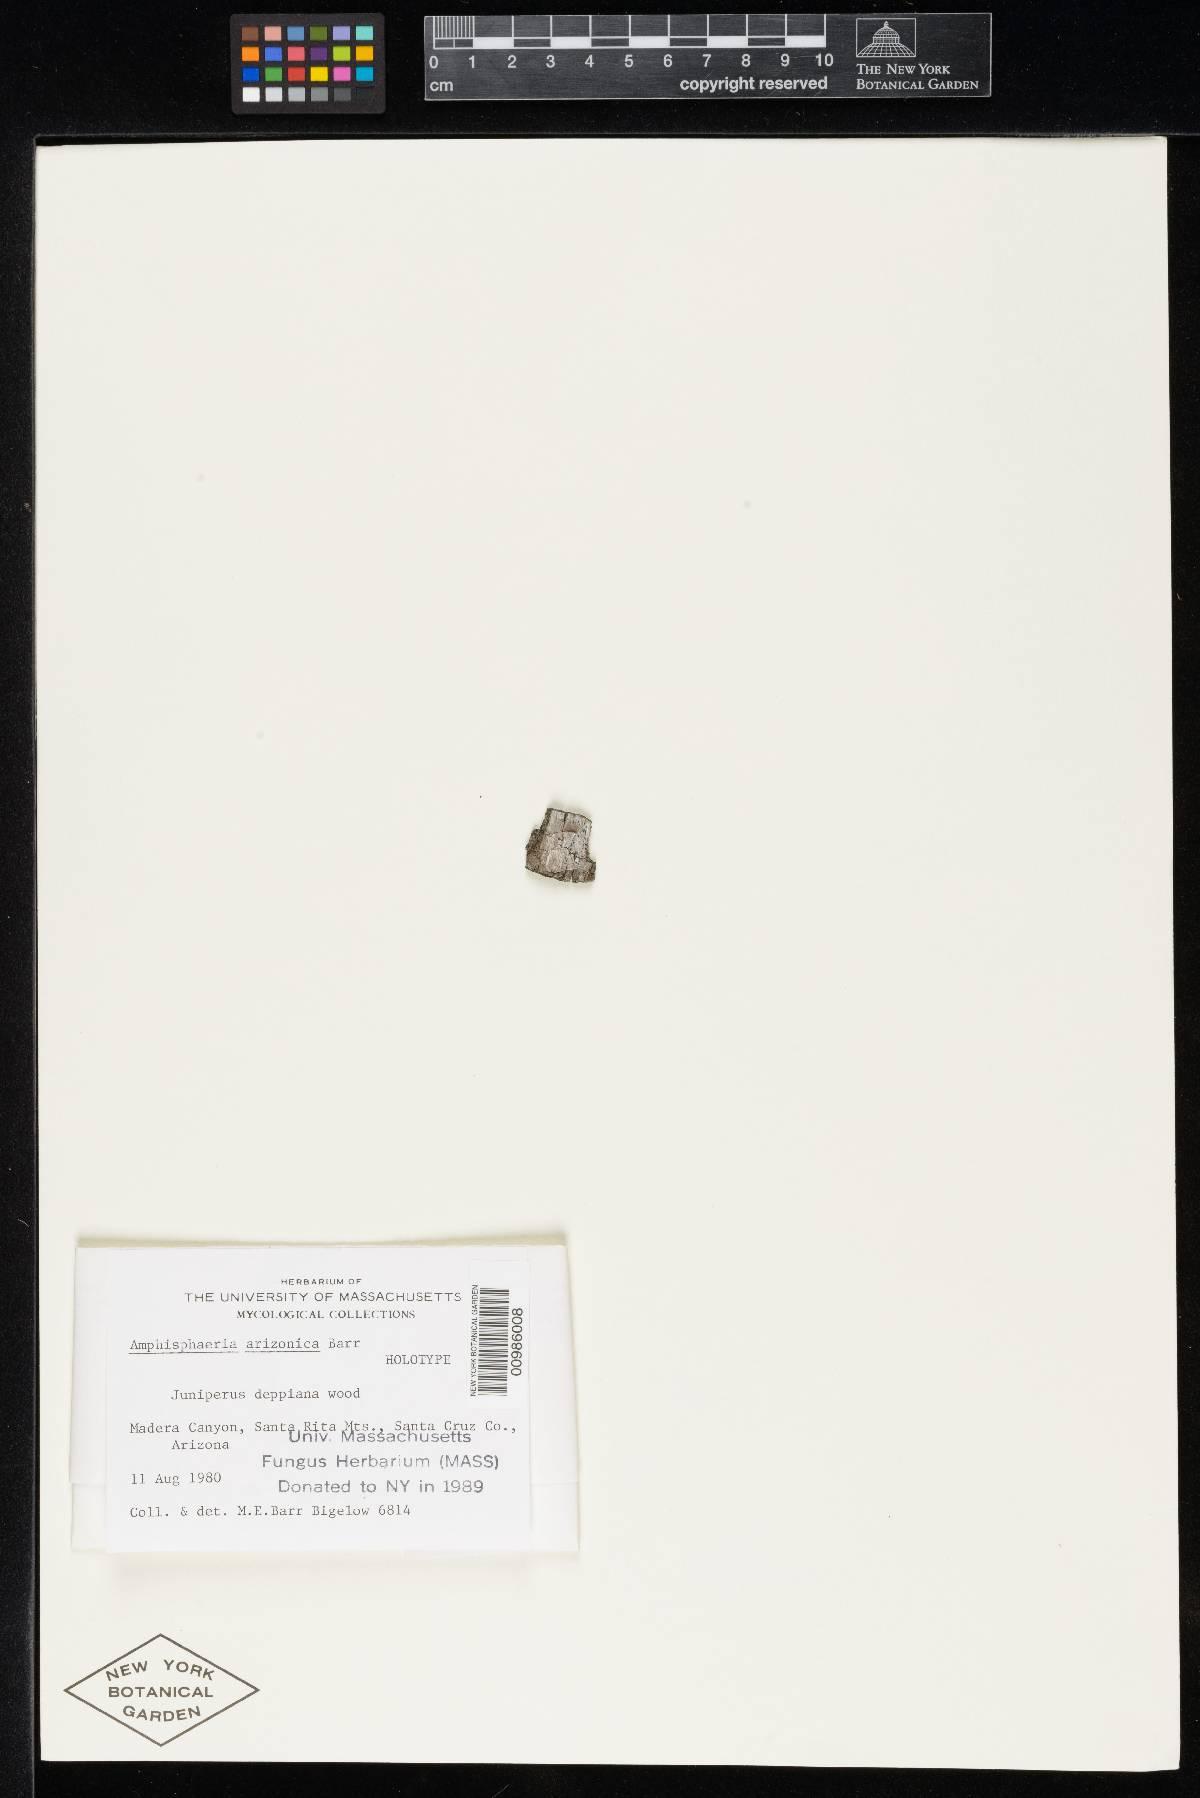 Amphisphaeria arizonica image